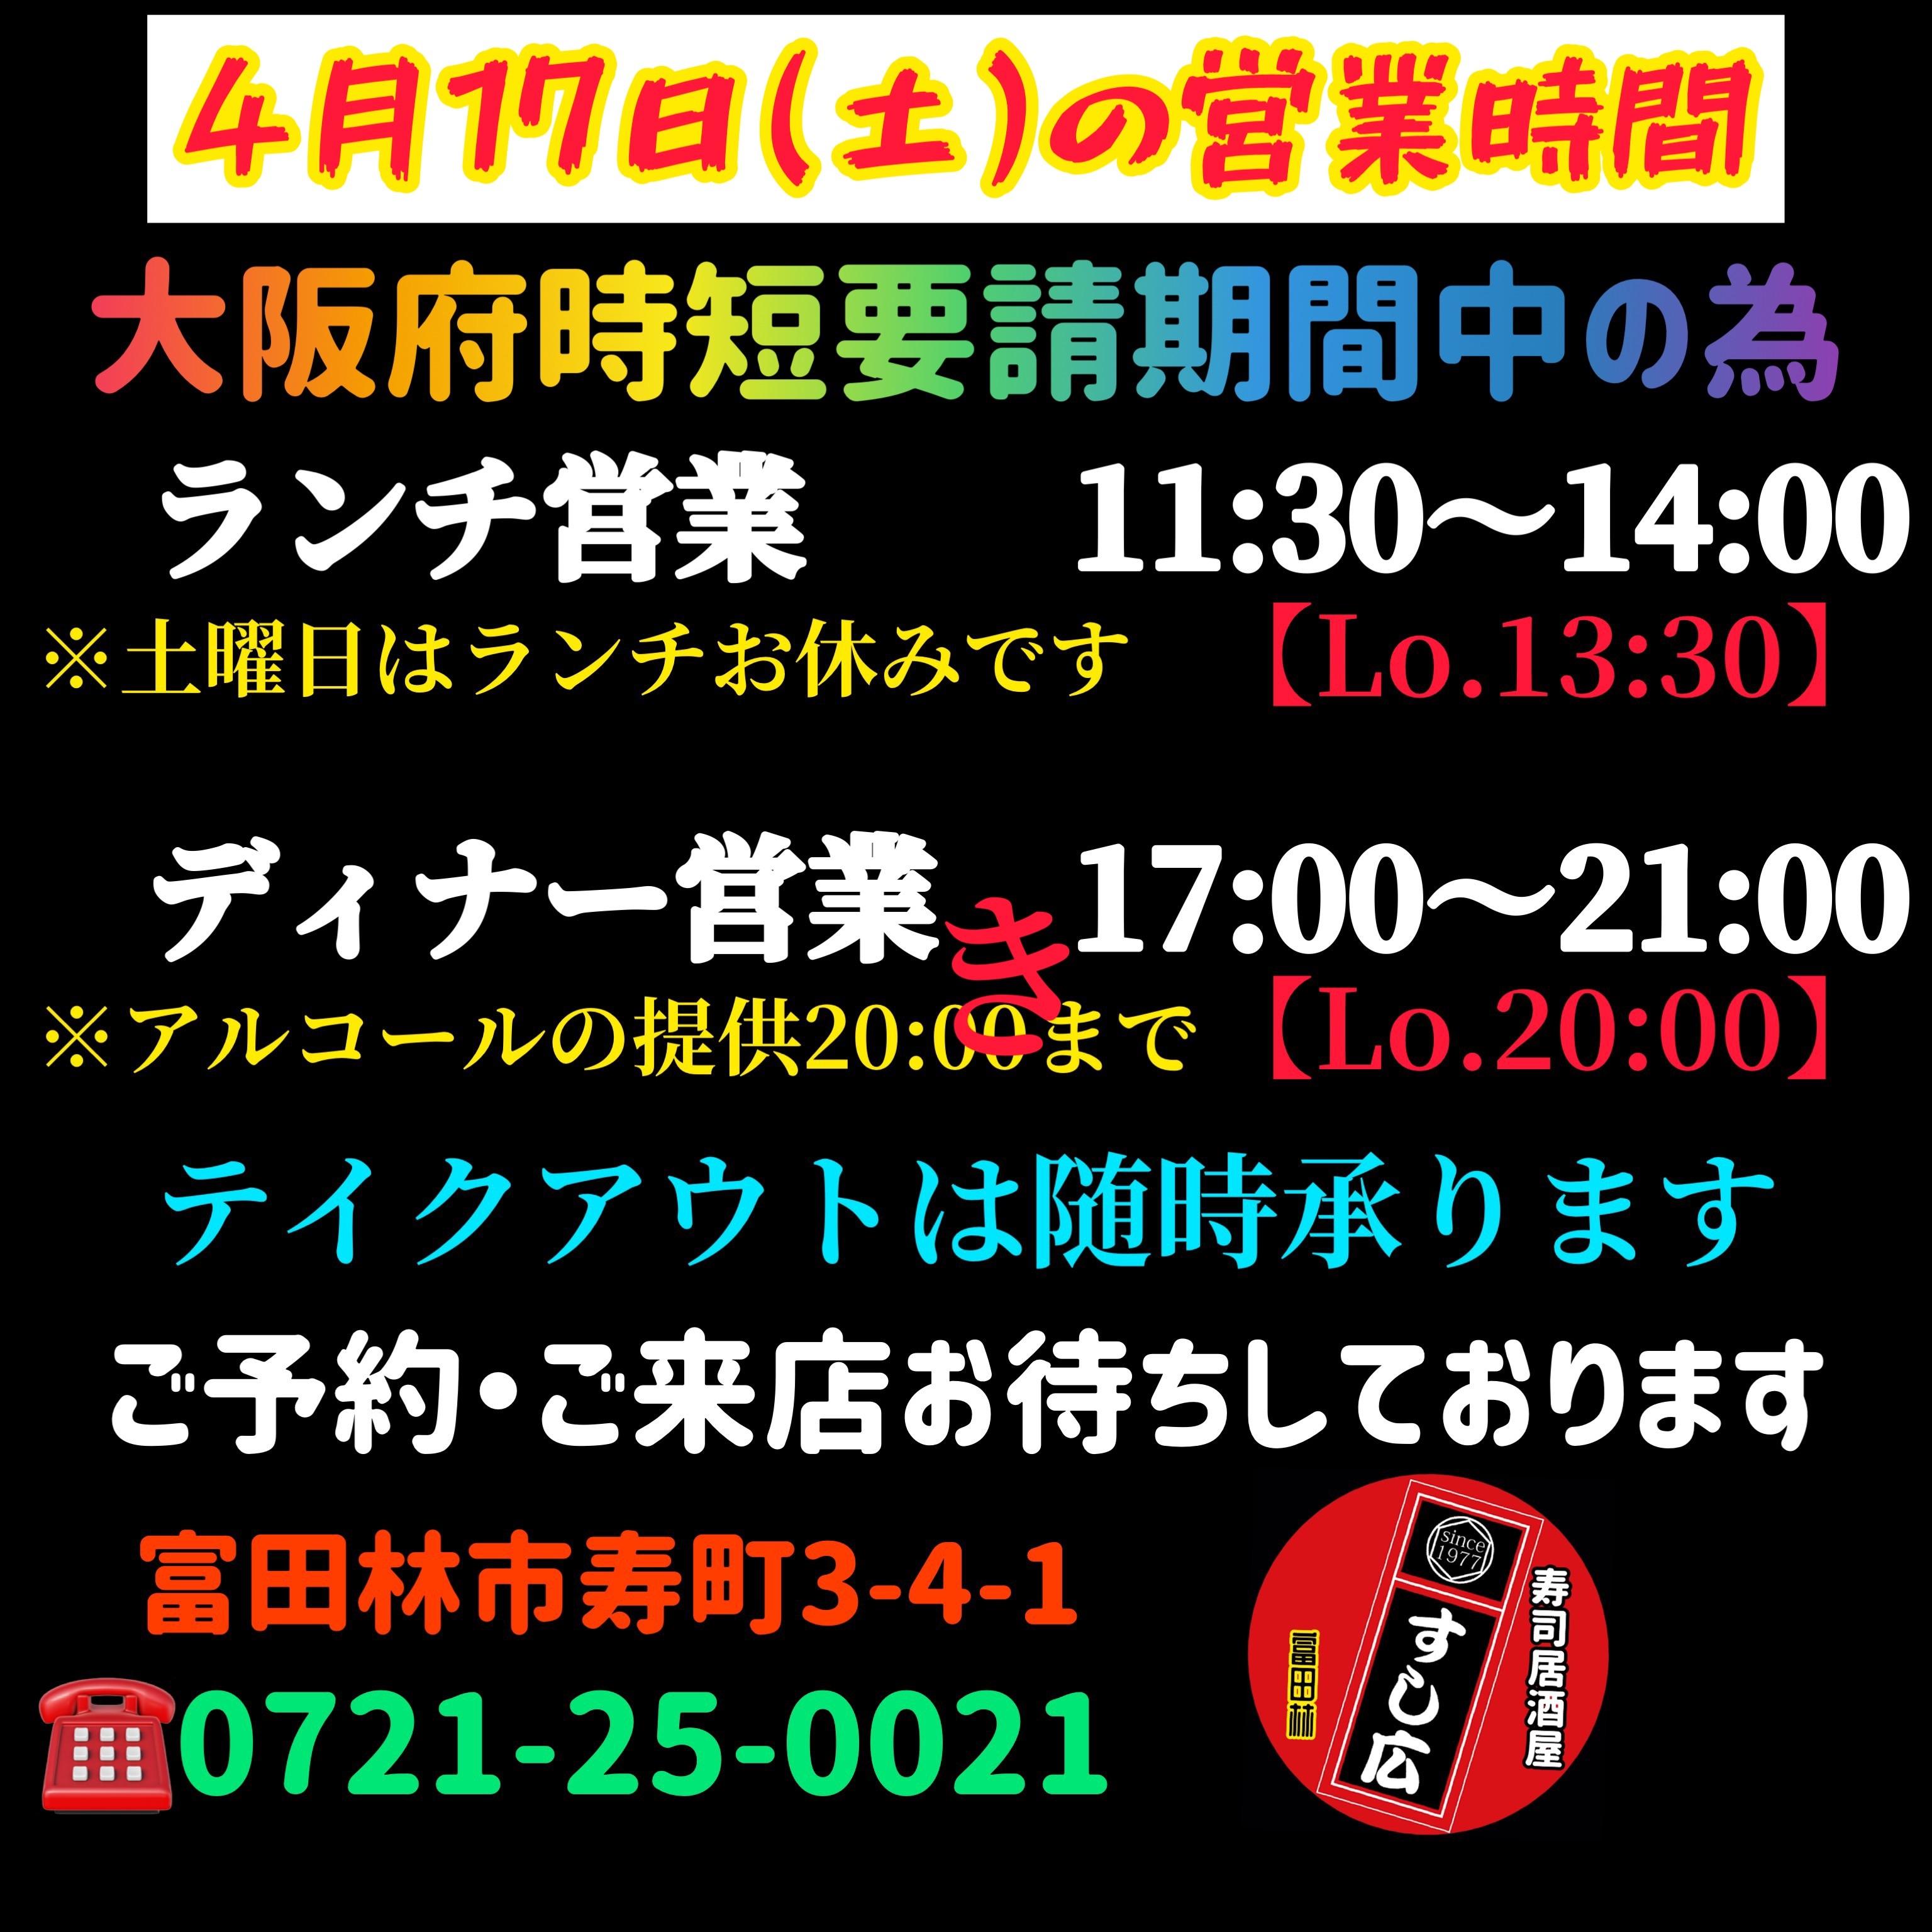 f:id:carp_0301_kenta:20210417144616j:image